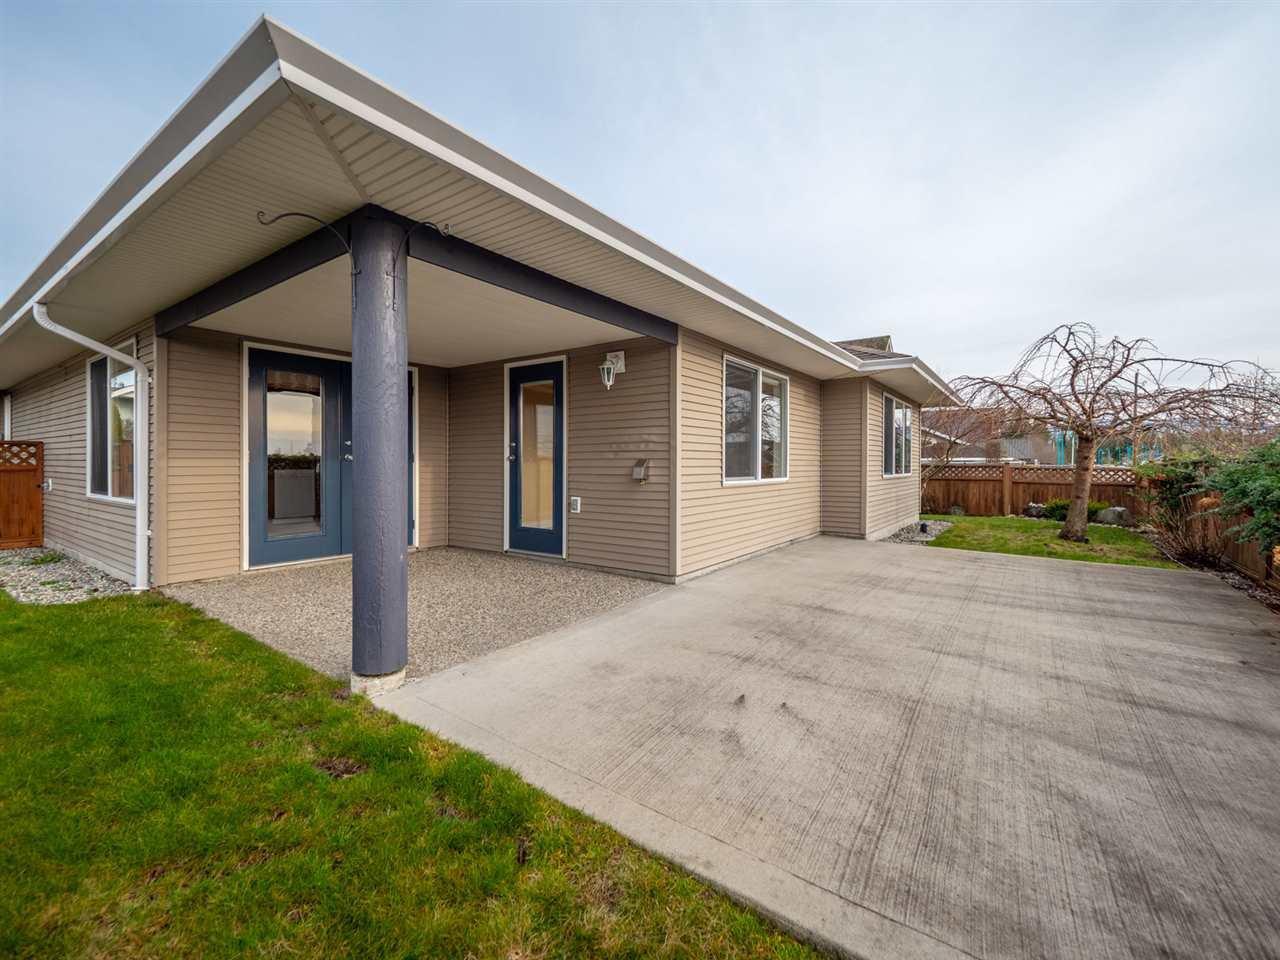 Photo 17: Photos: 5708 EMILY Way in Sechelt: Sechelt District House for sale (Sunshine Coast)  : MLS®# R2328606